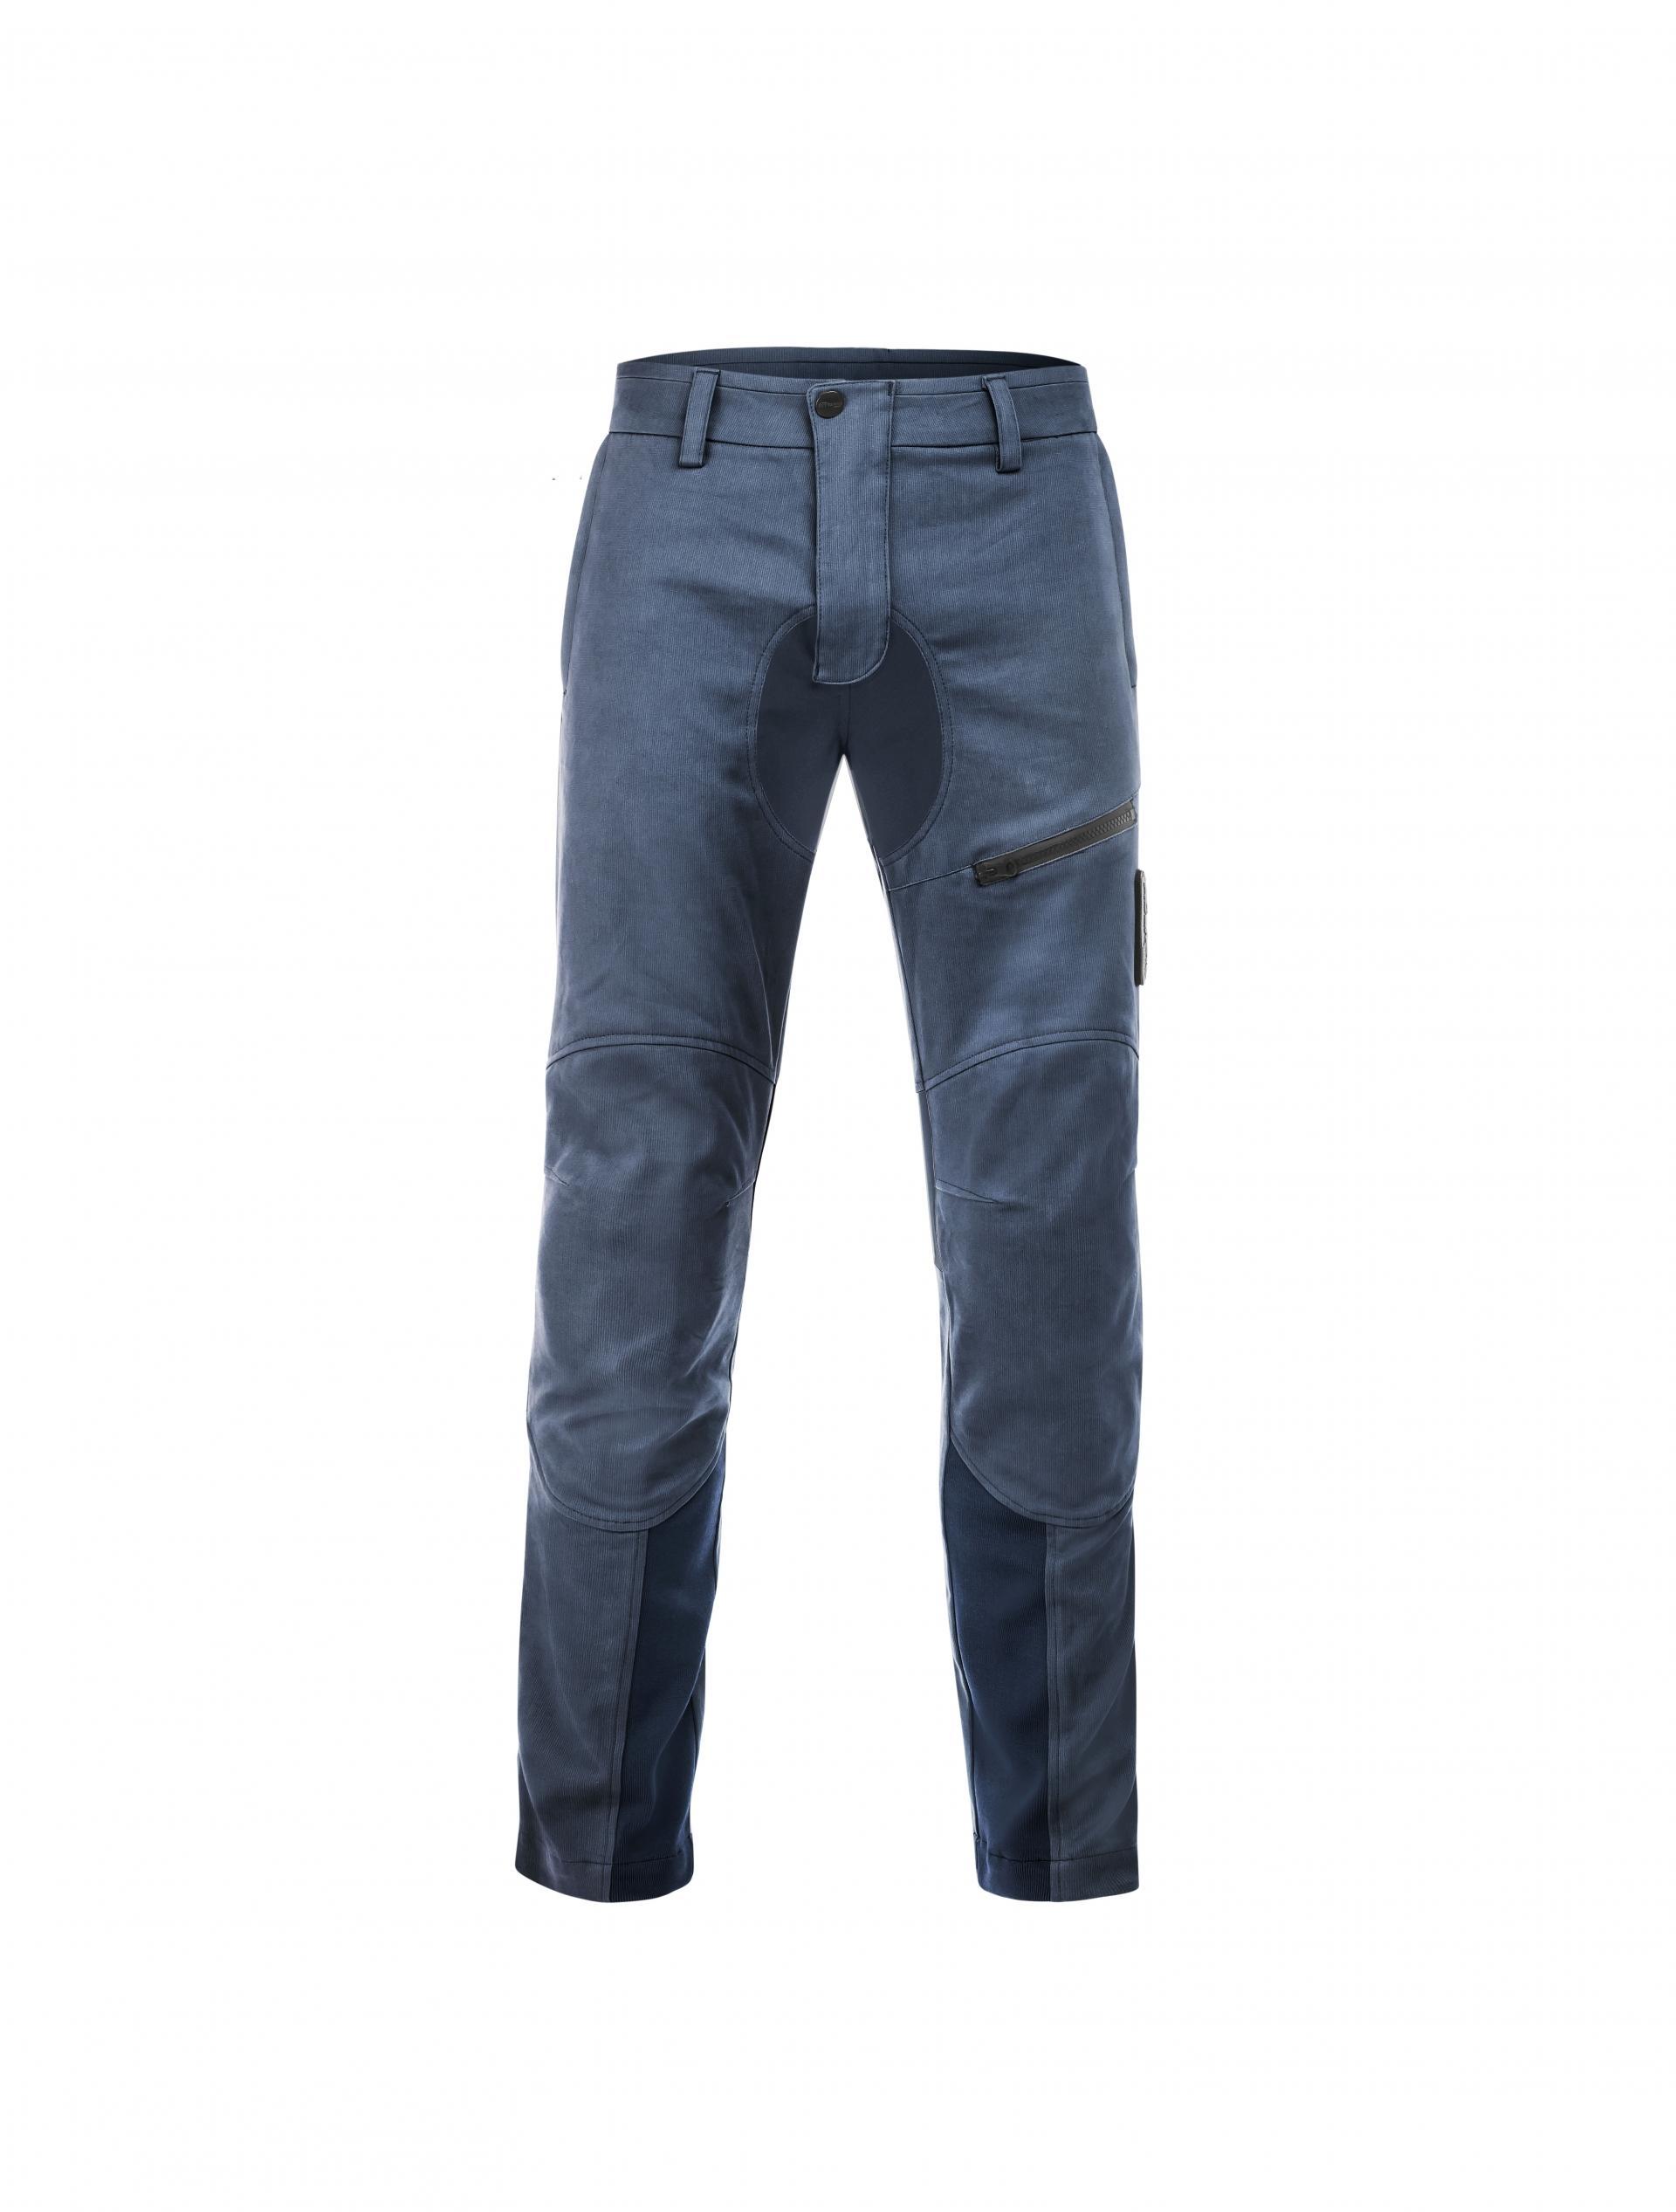 Pantaloni moto Ottano 2.0 Blu 1